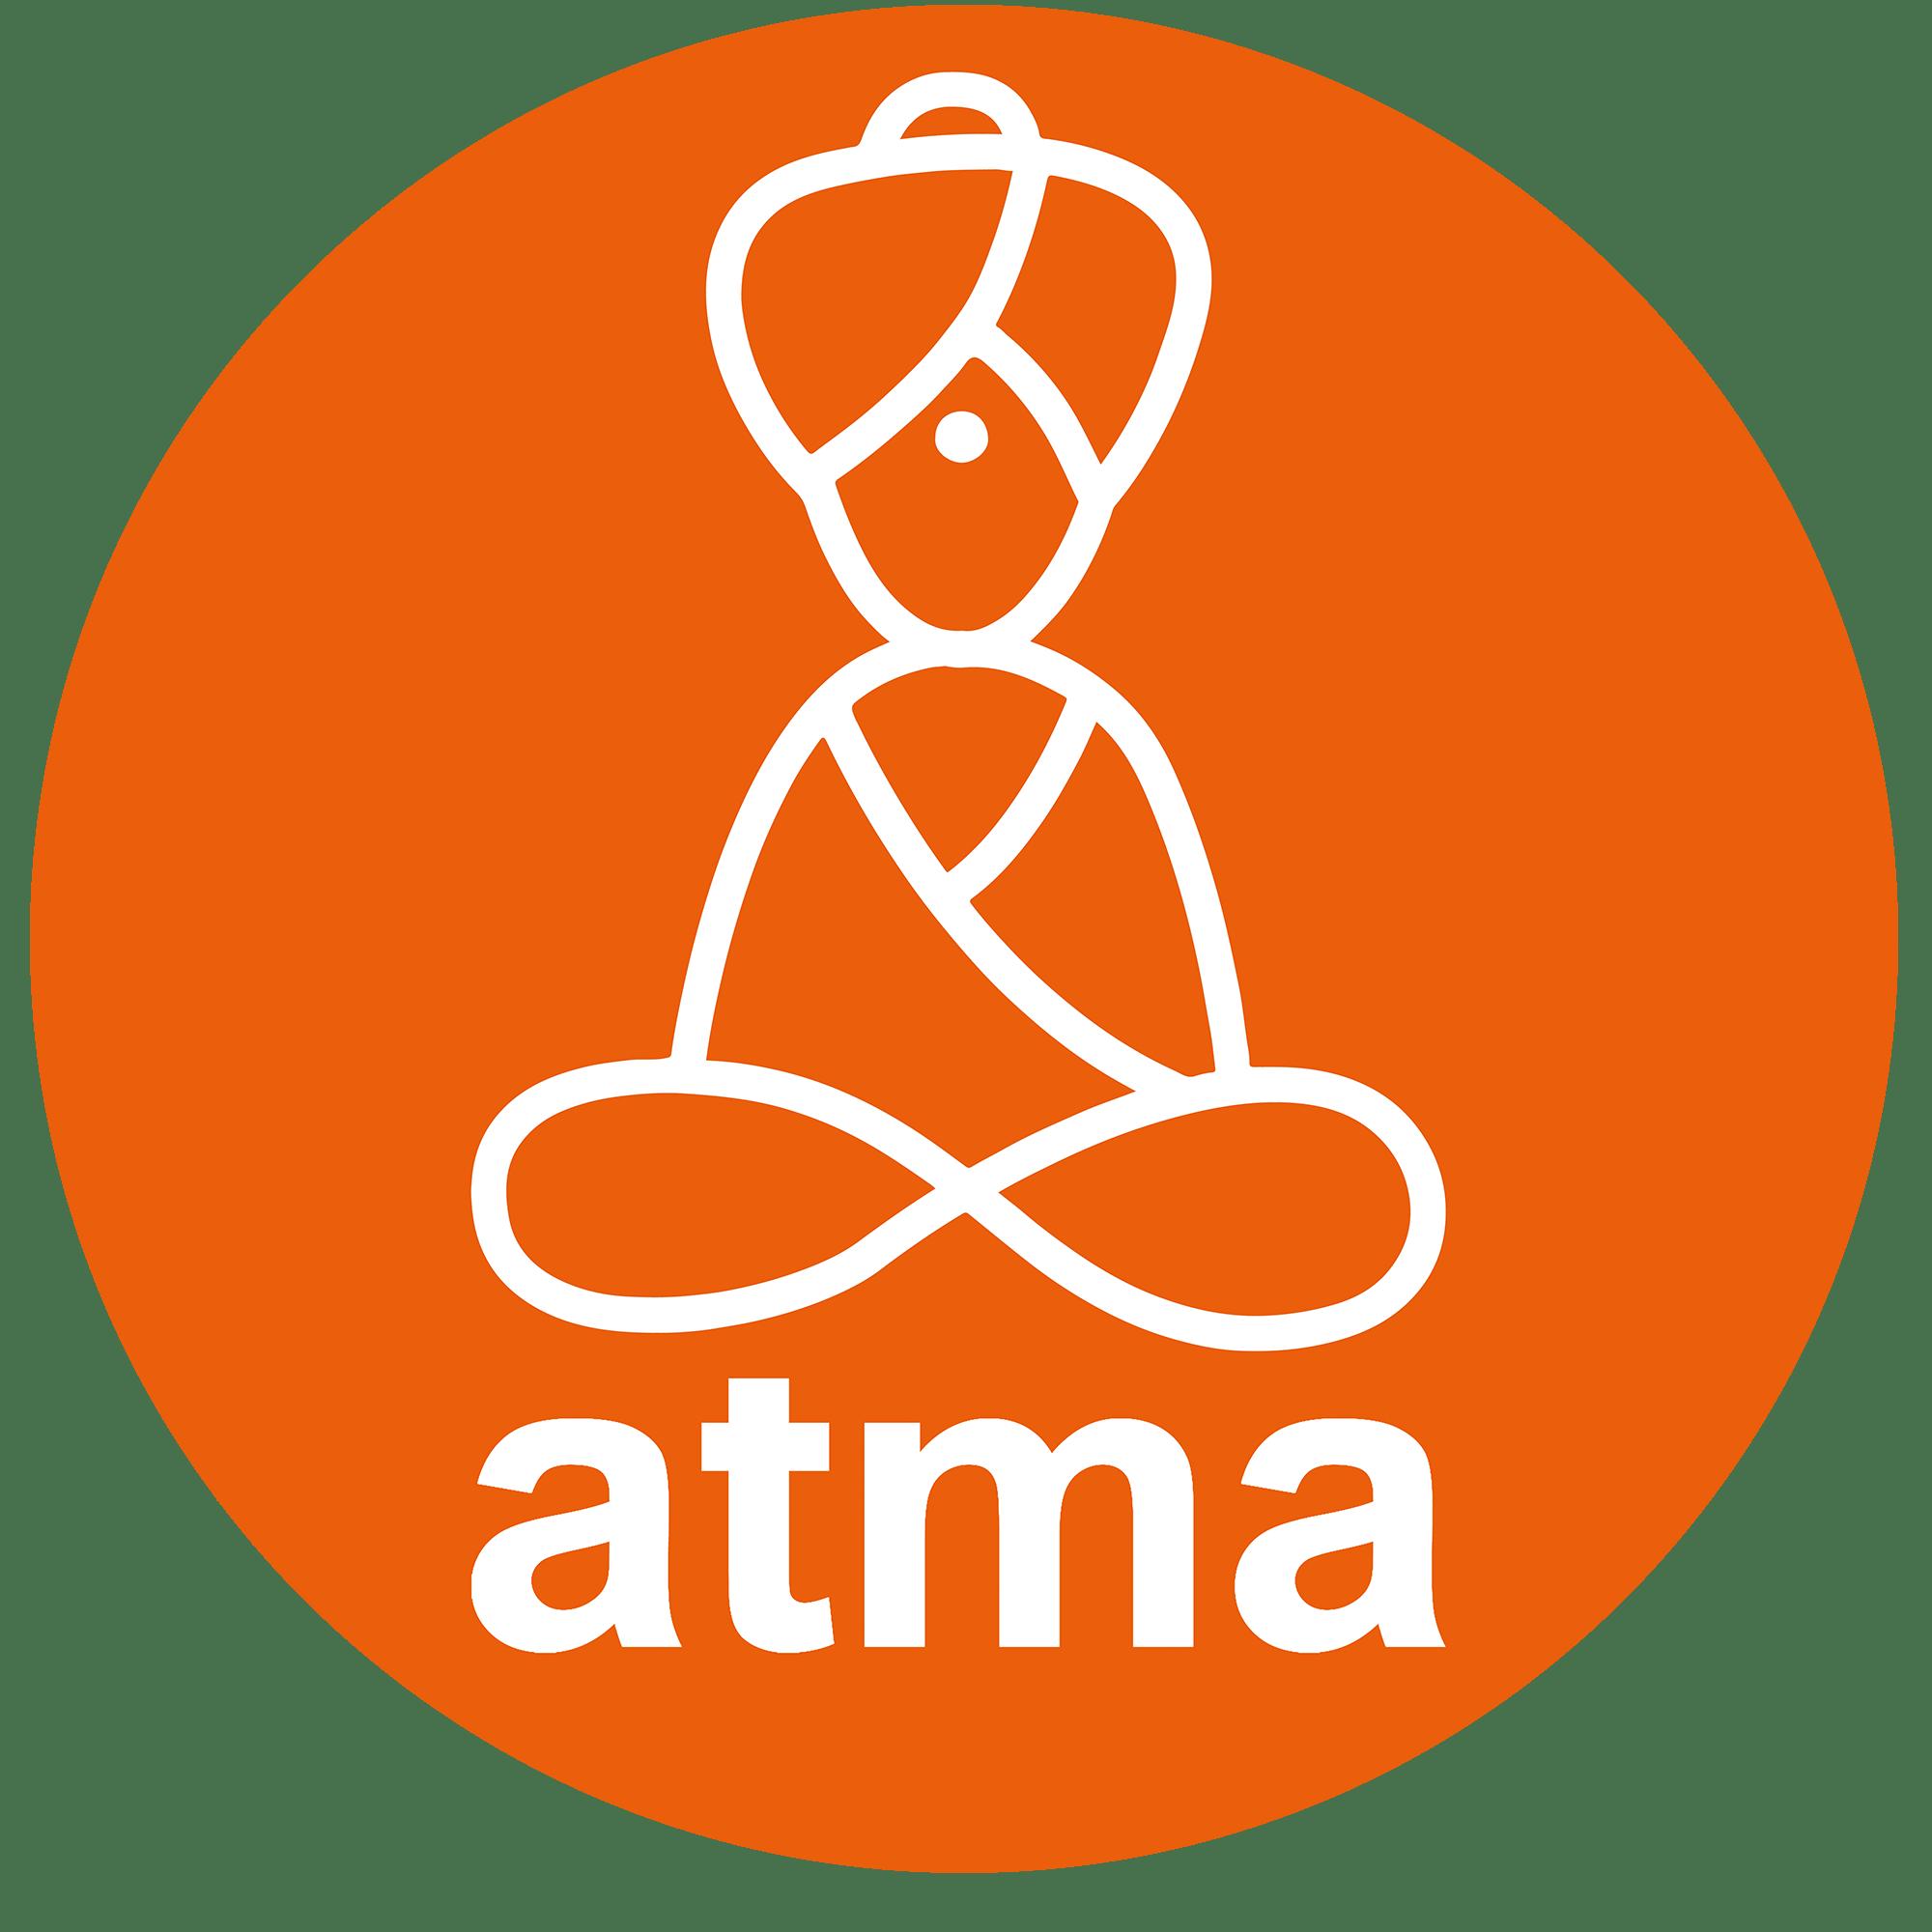 Atma darshan and atma nirvriti pdf > donkeytime.org